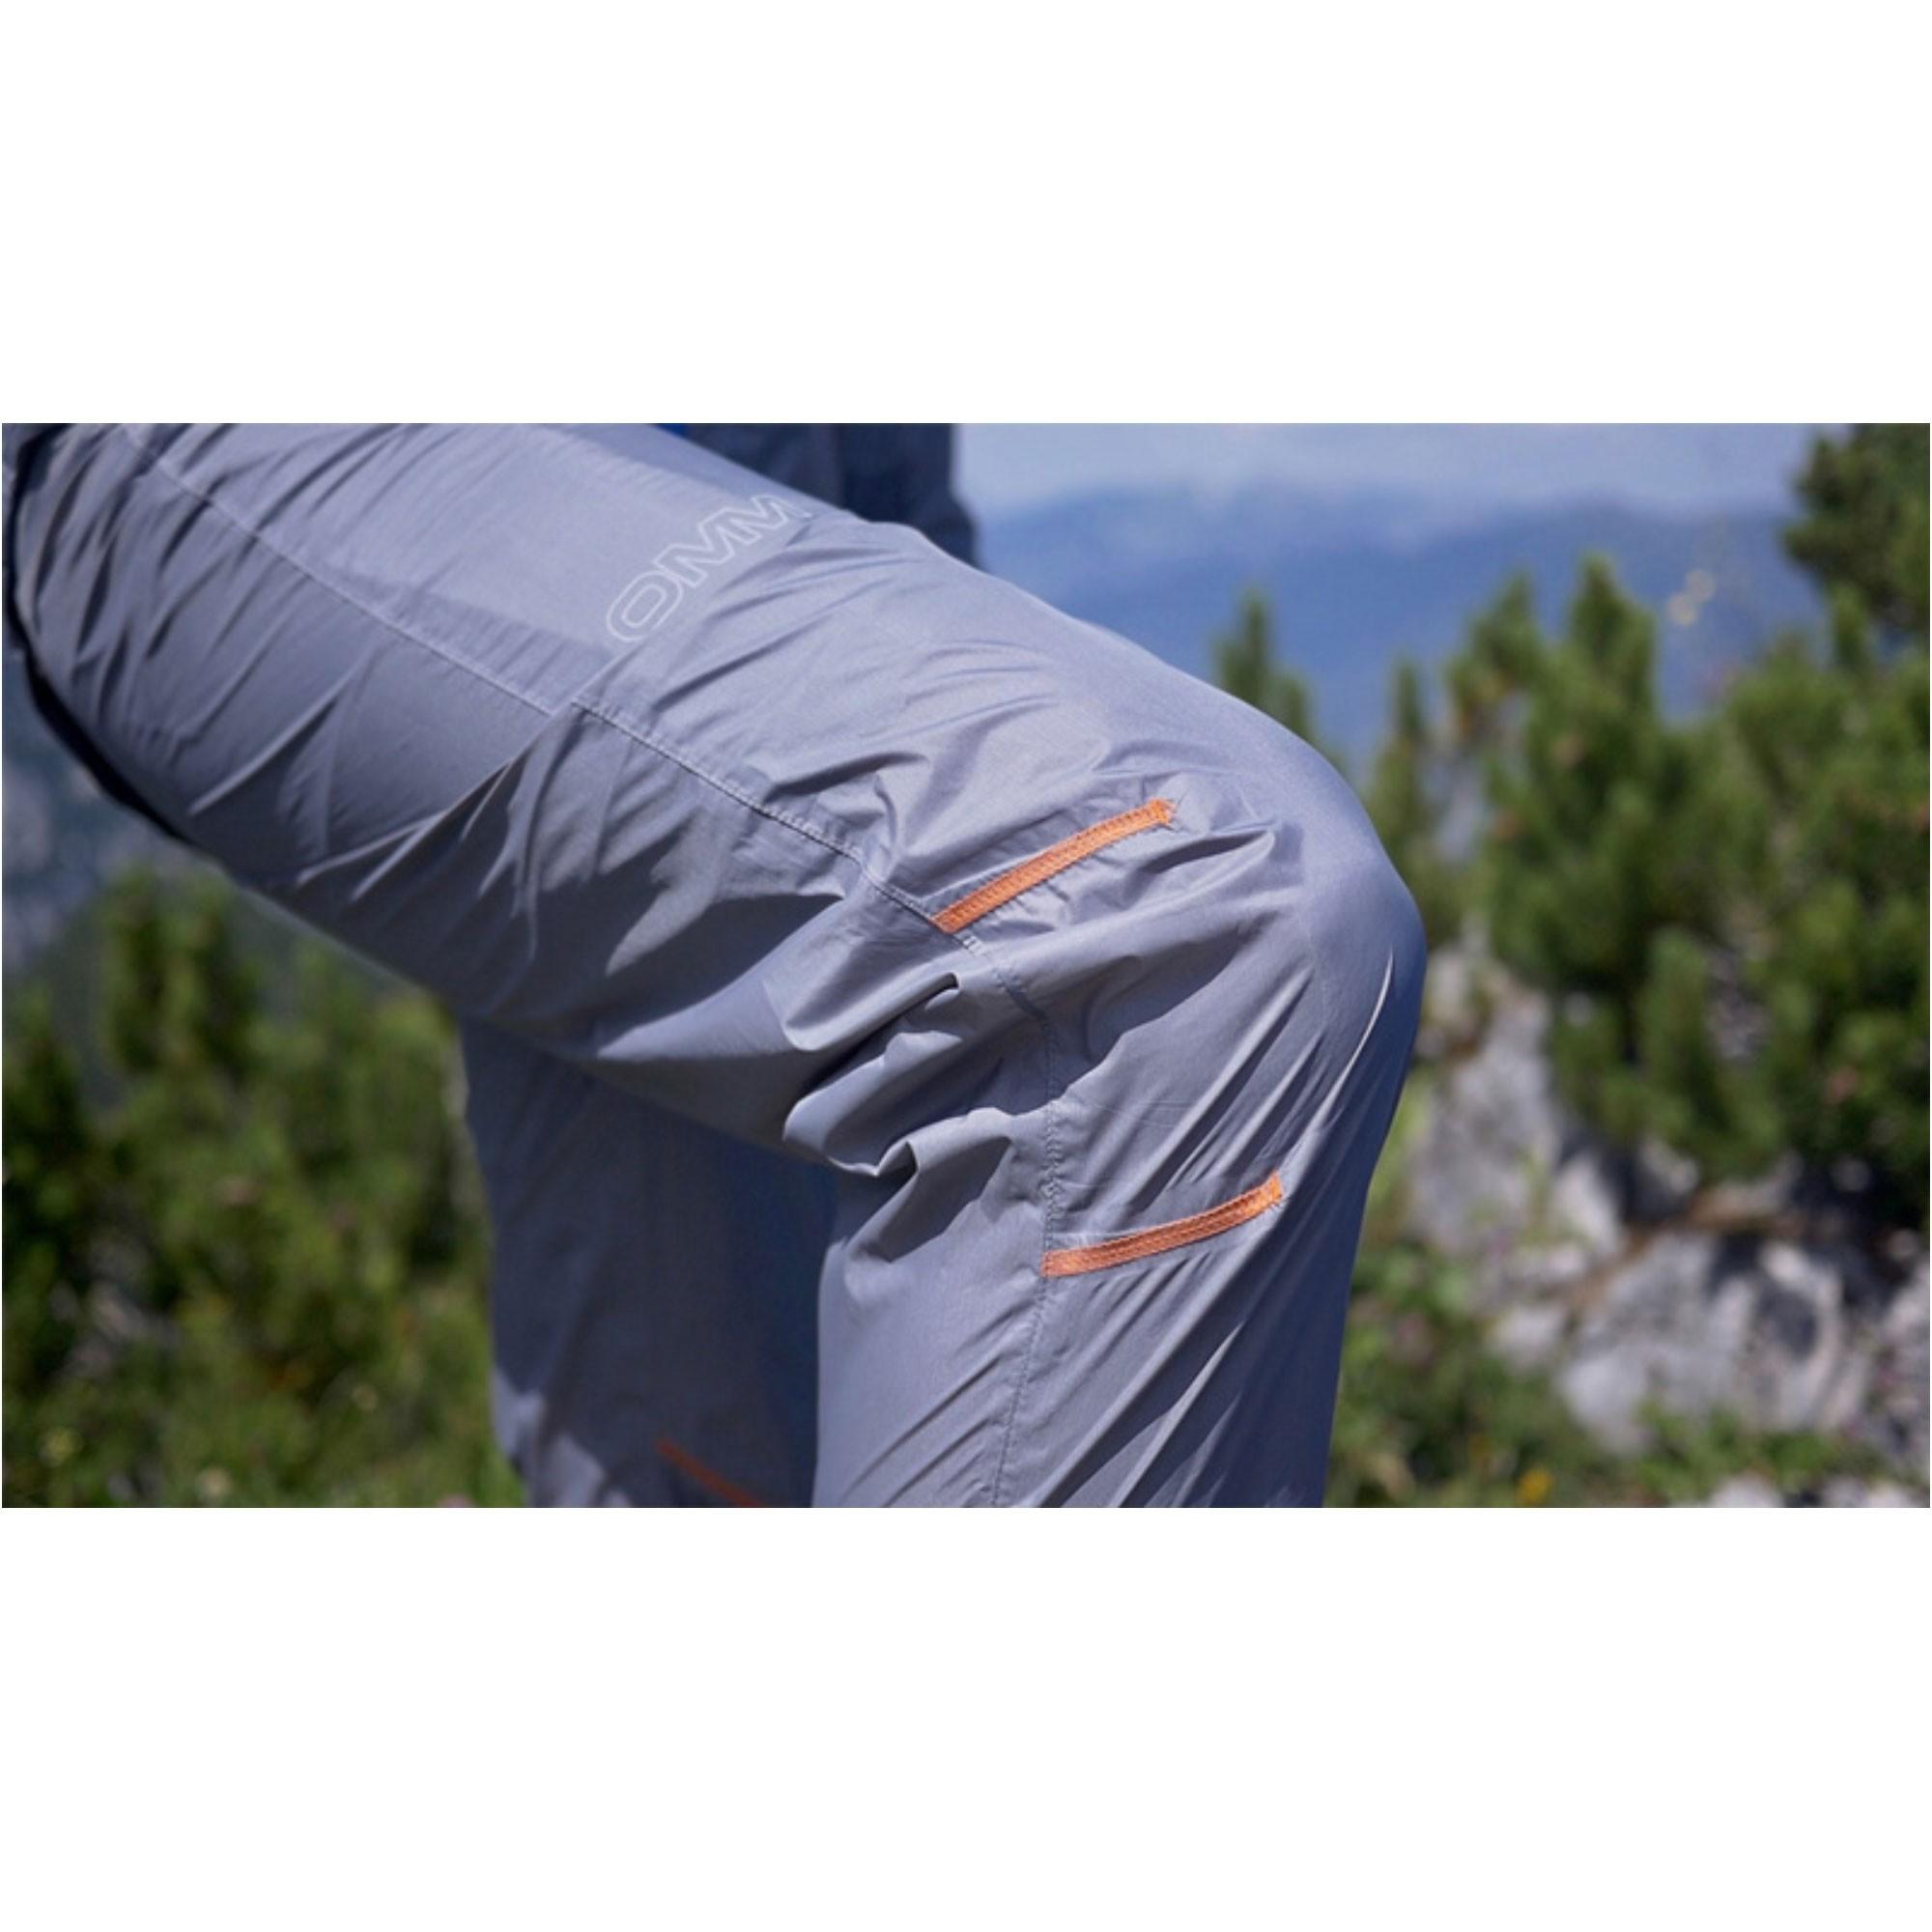 OMM Halo Men's Waterproof Pants - Grey - articulated knee